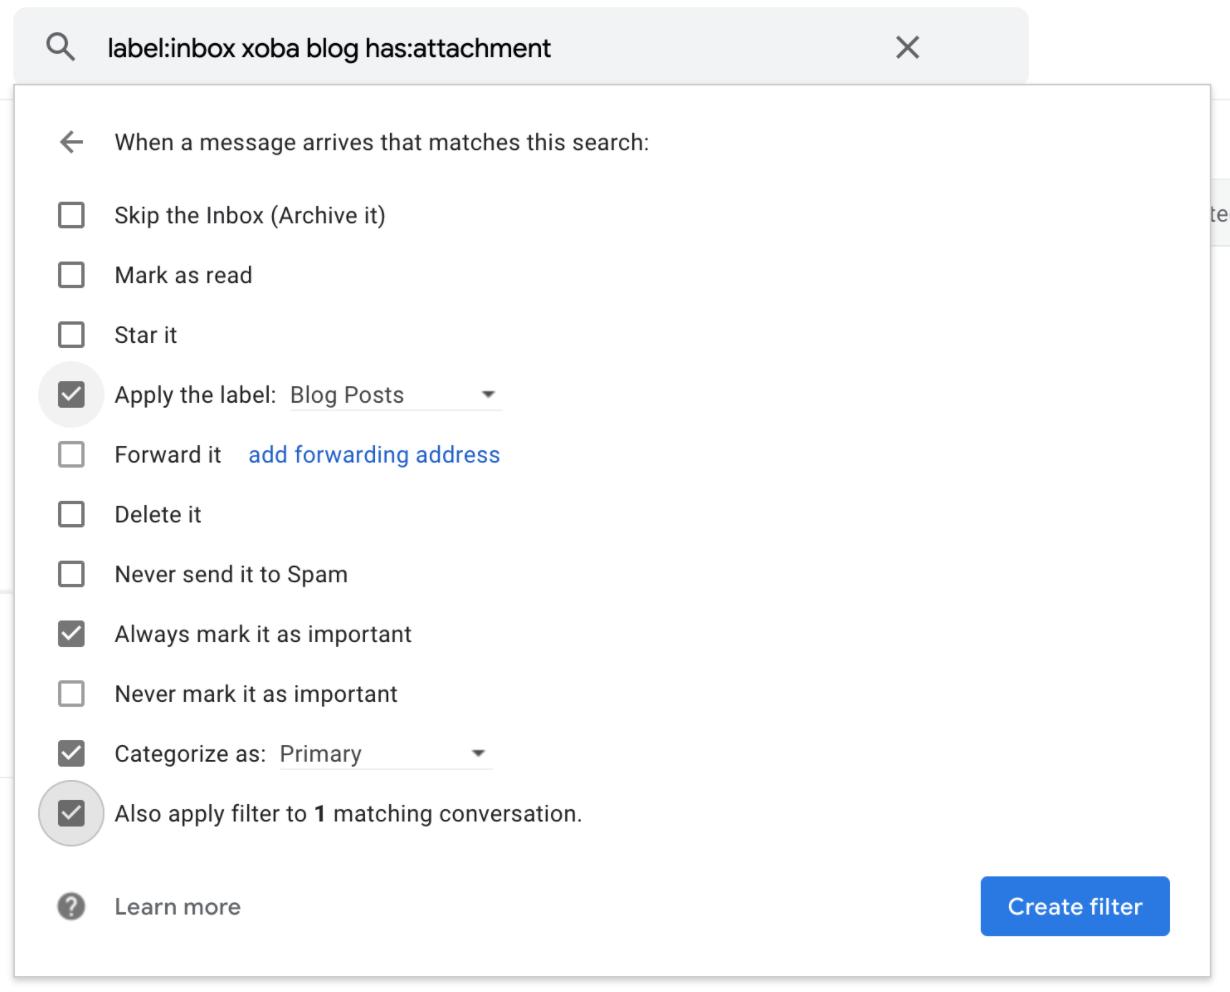 xoba-gmail-blog-2